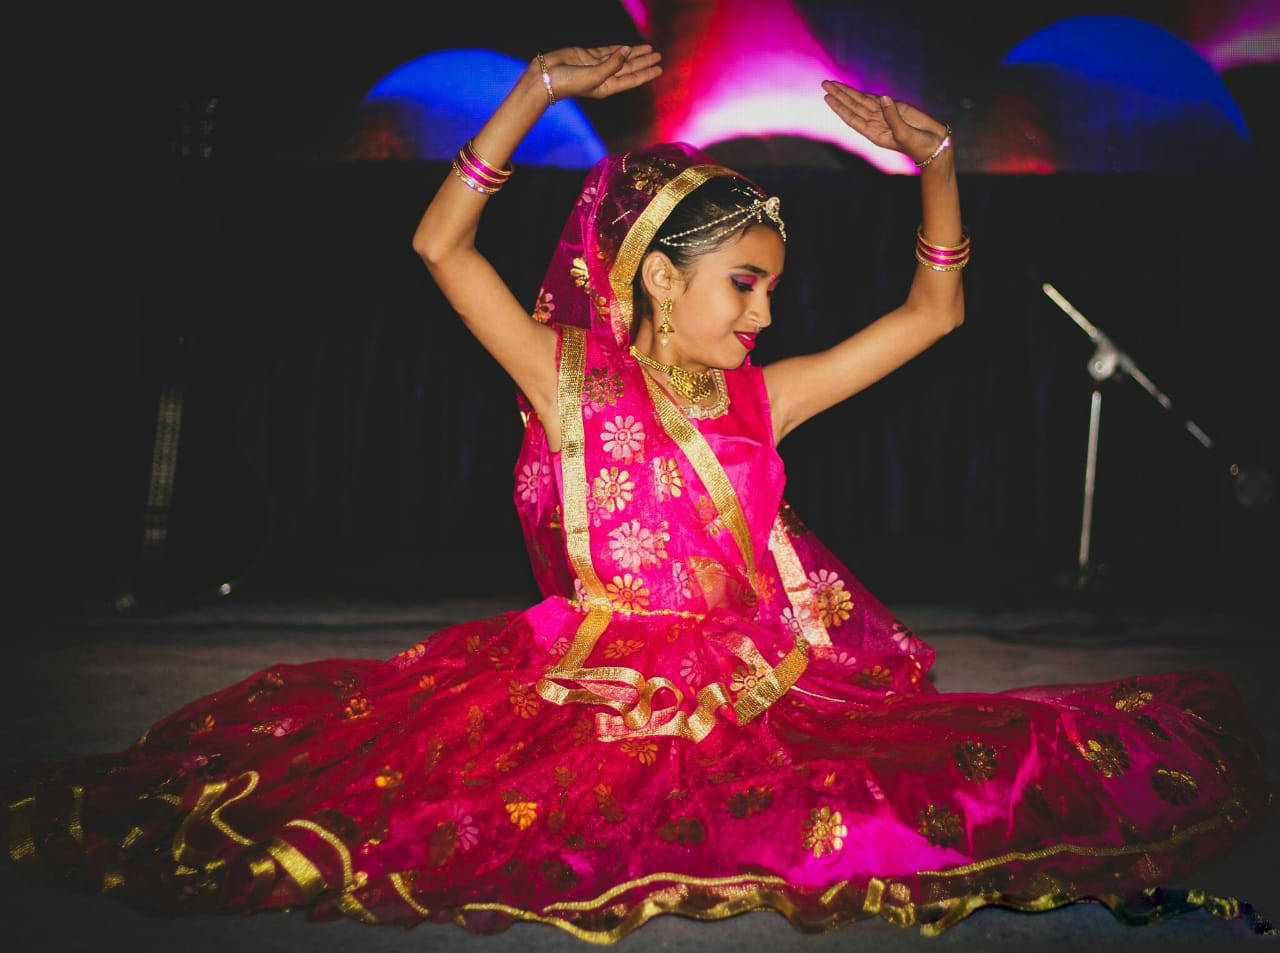 9-year-old Vaibhavi More